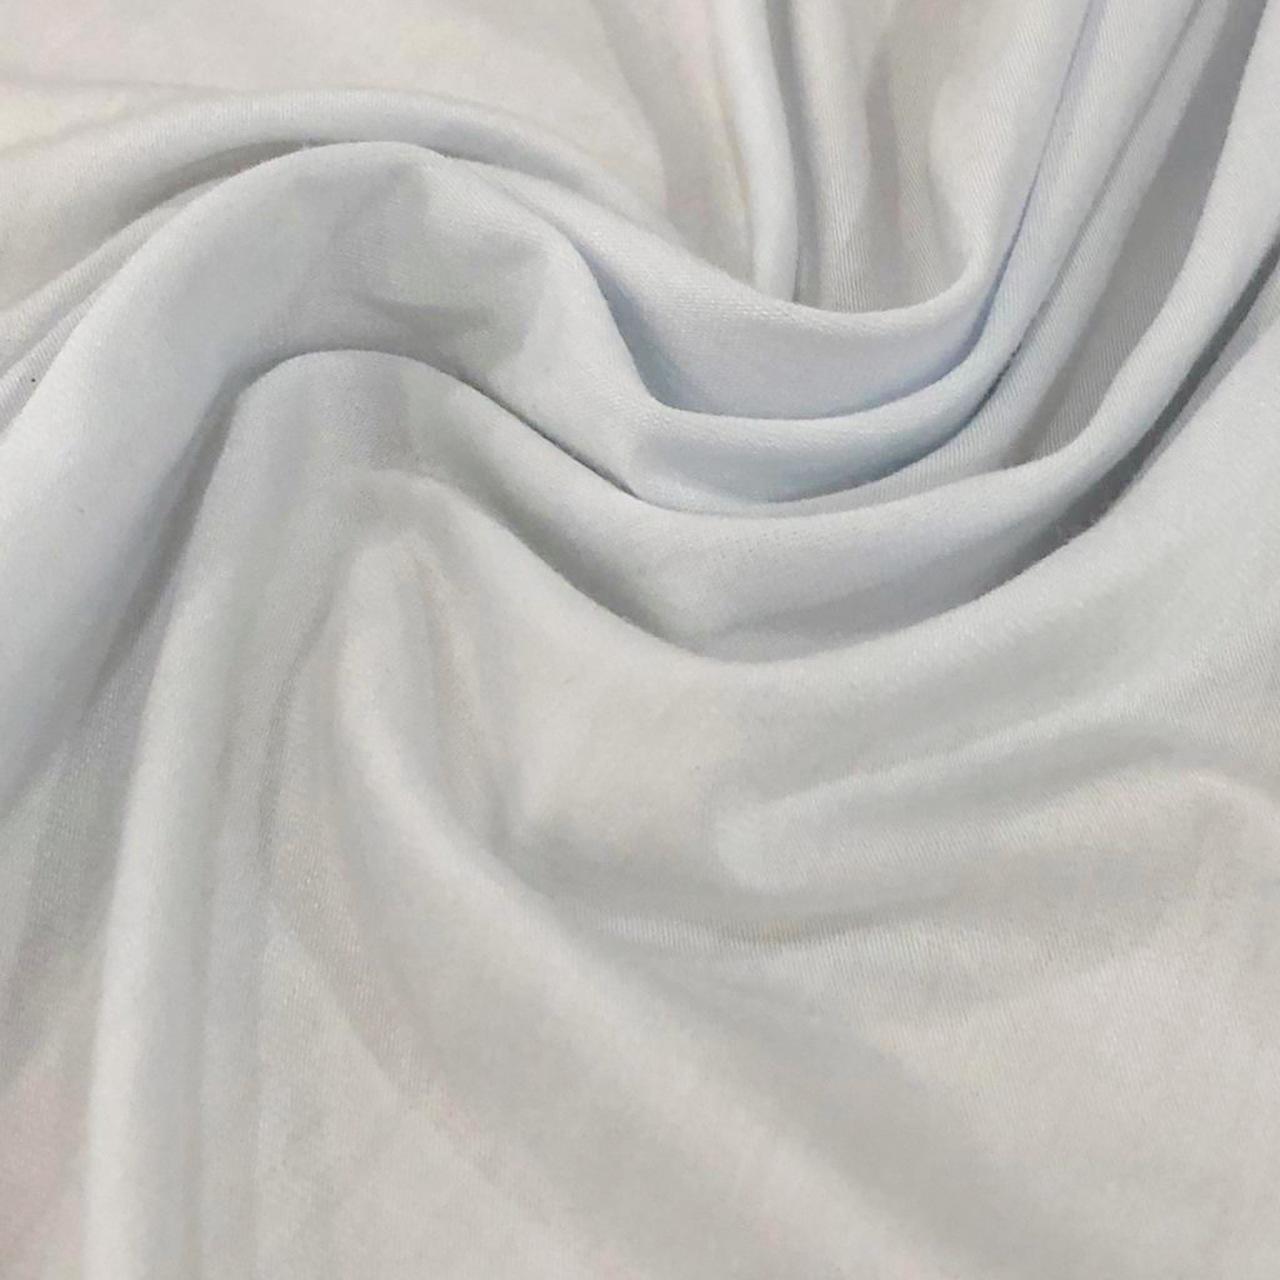 Tecido Malha Viscolycra  92%Viscose 8%Elastano Branco